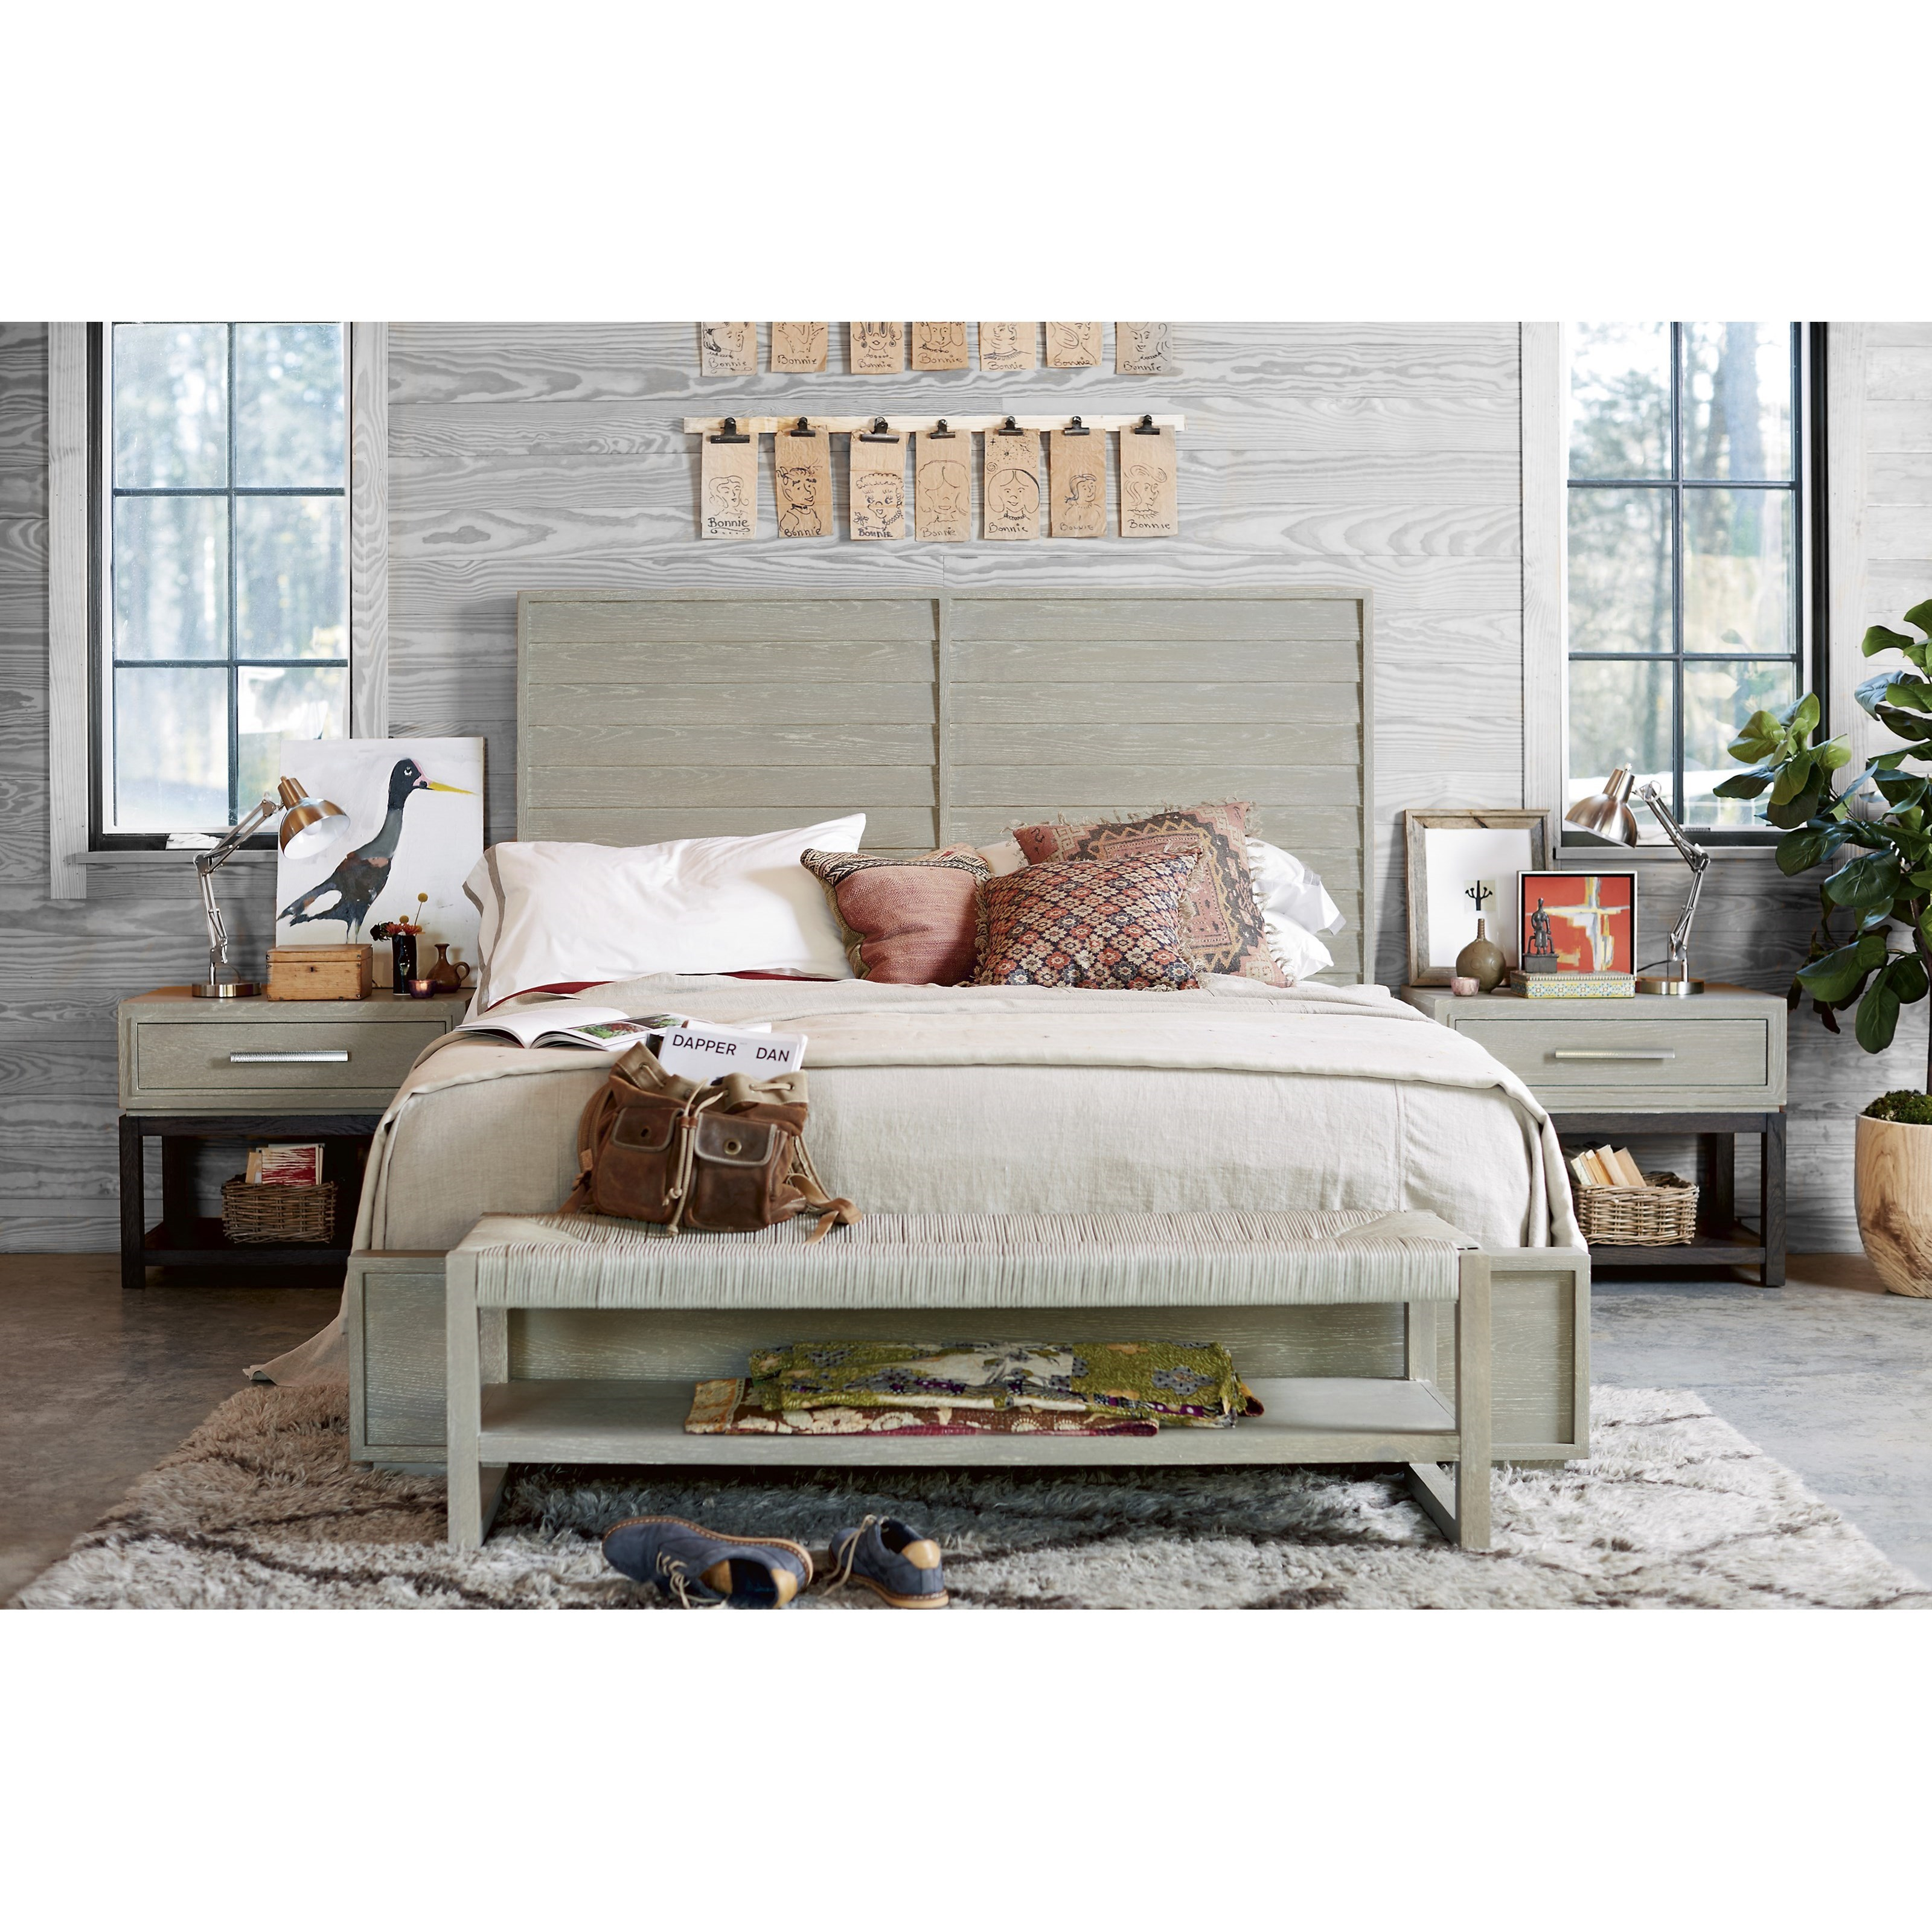 Zephyr King Bedroom Group by Universal at Baer's Furniture